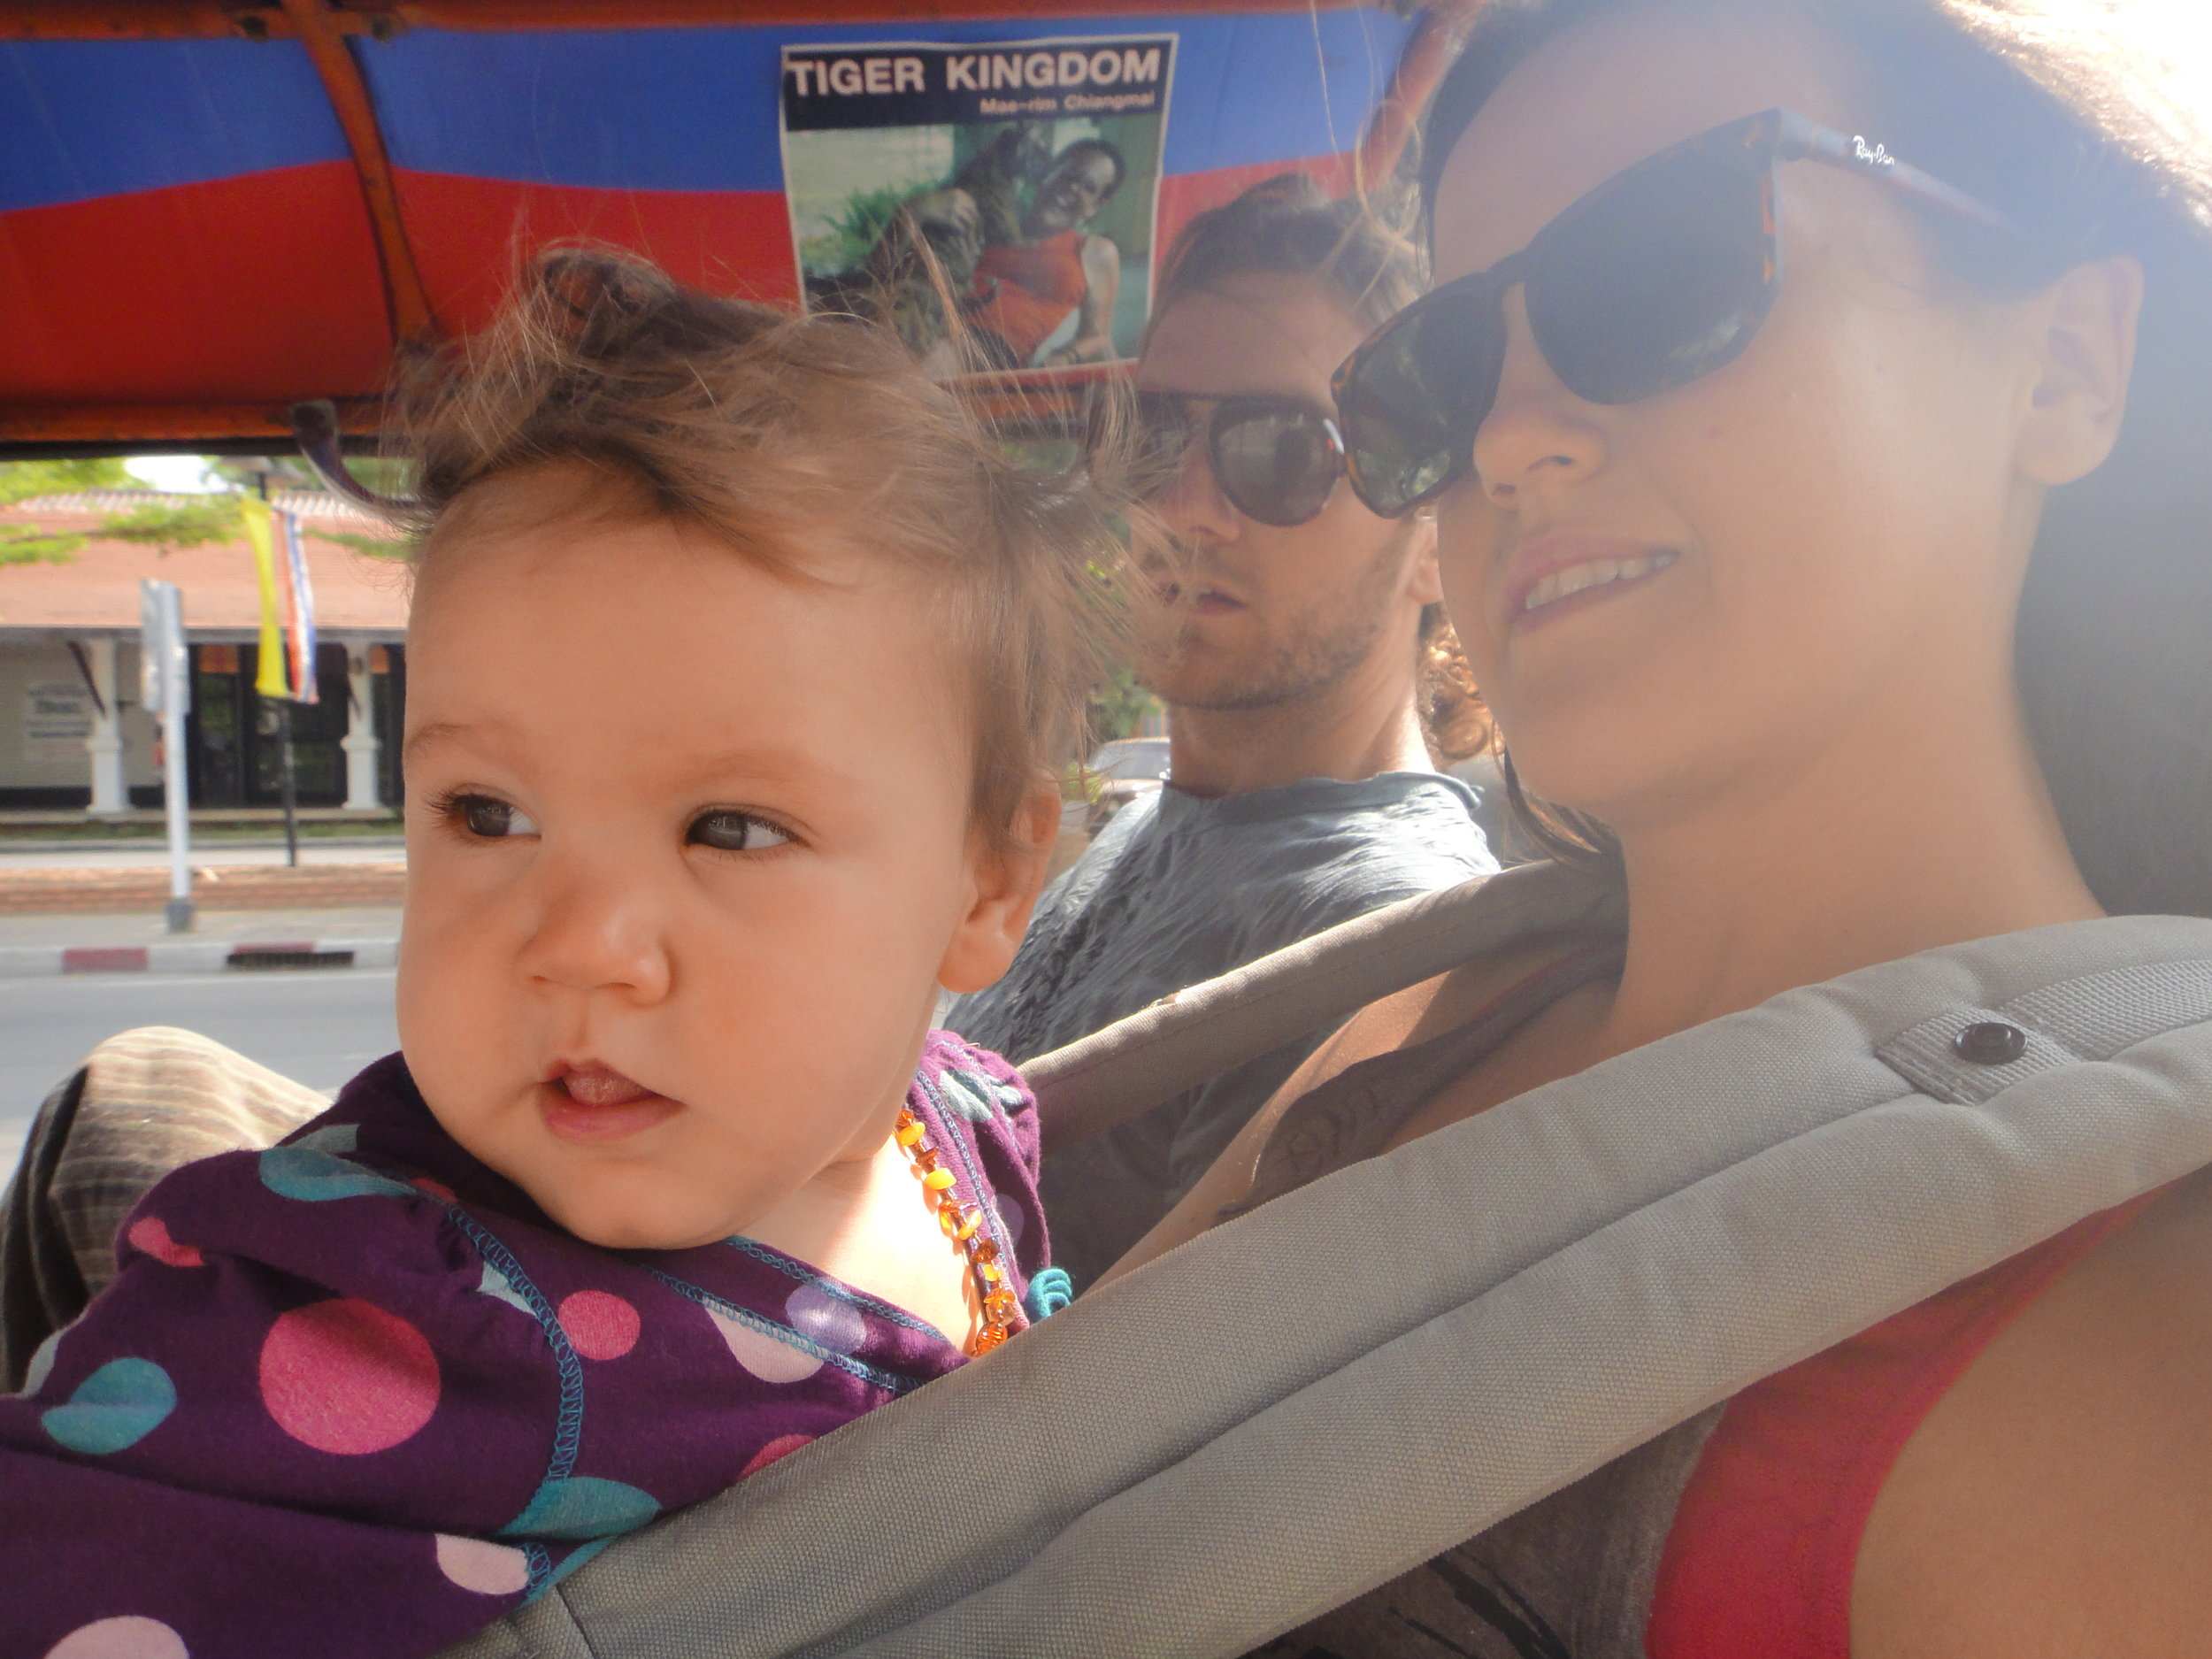 Baby Astraea enjoying the rush of a Tuk Tuk ride in Thailand